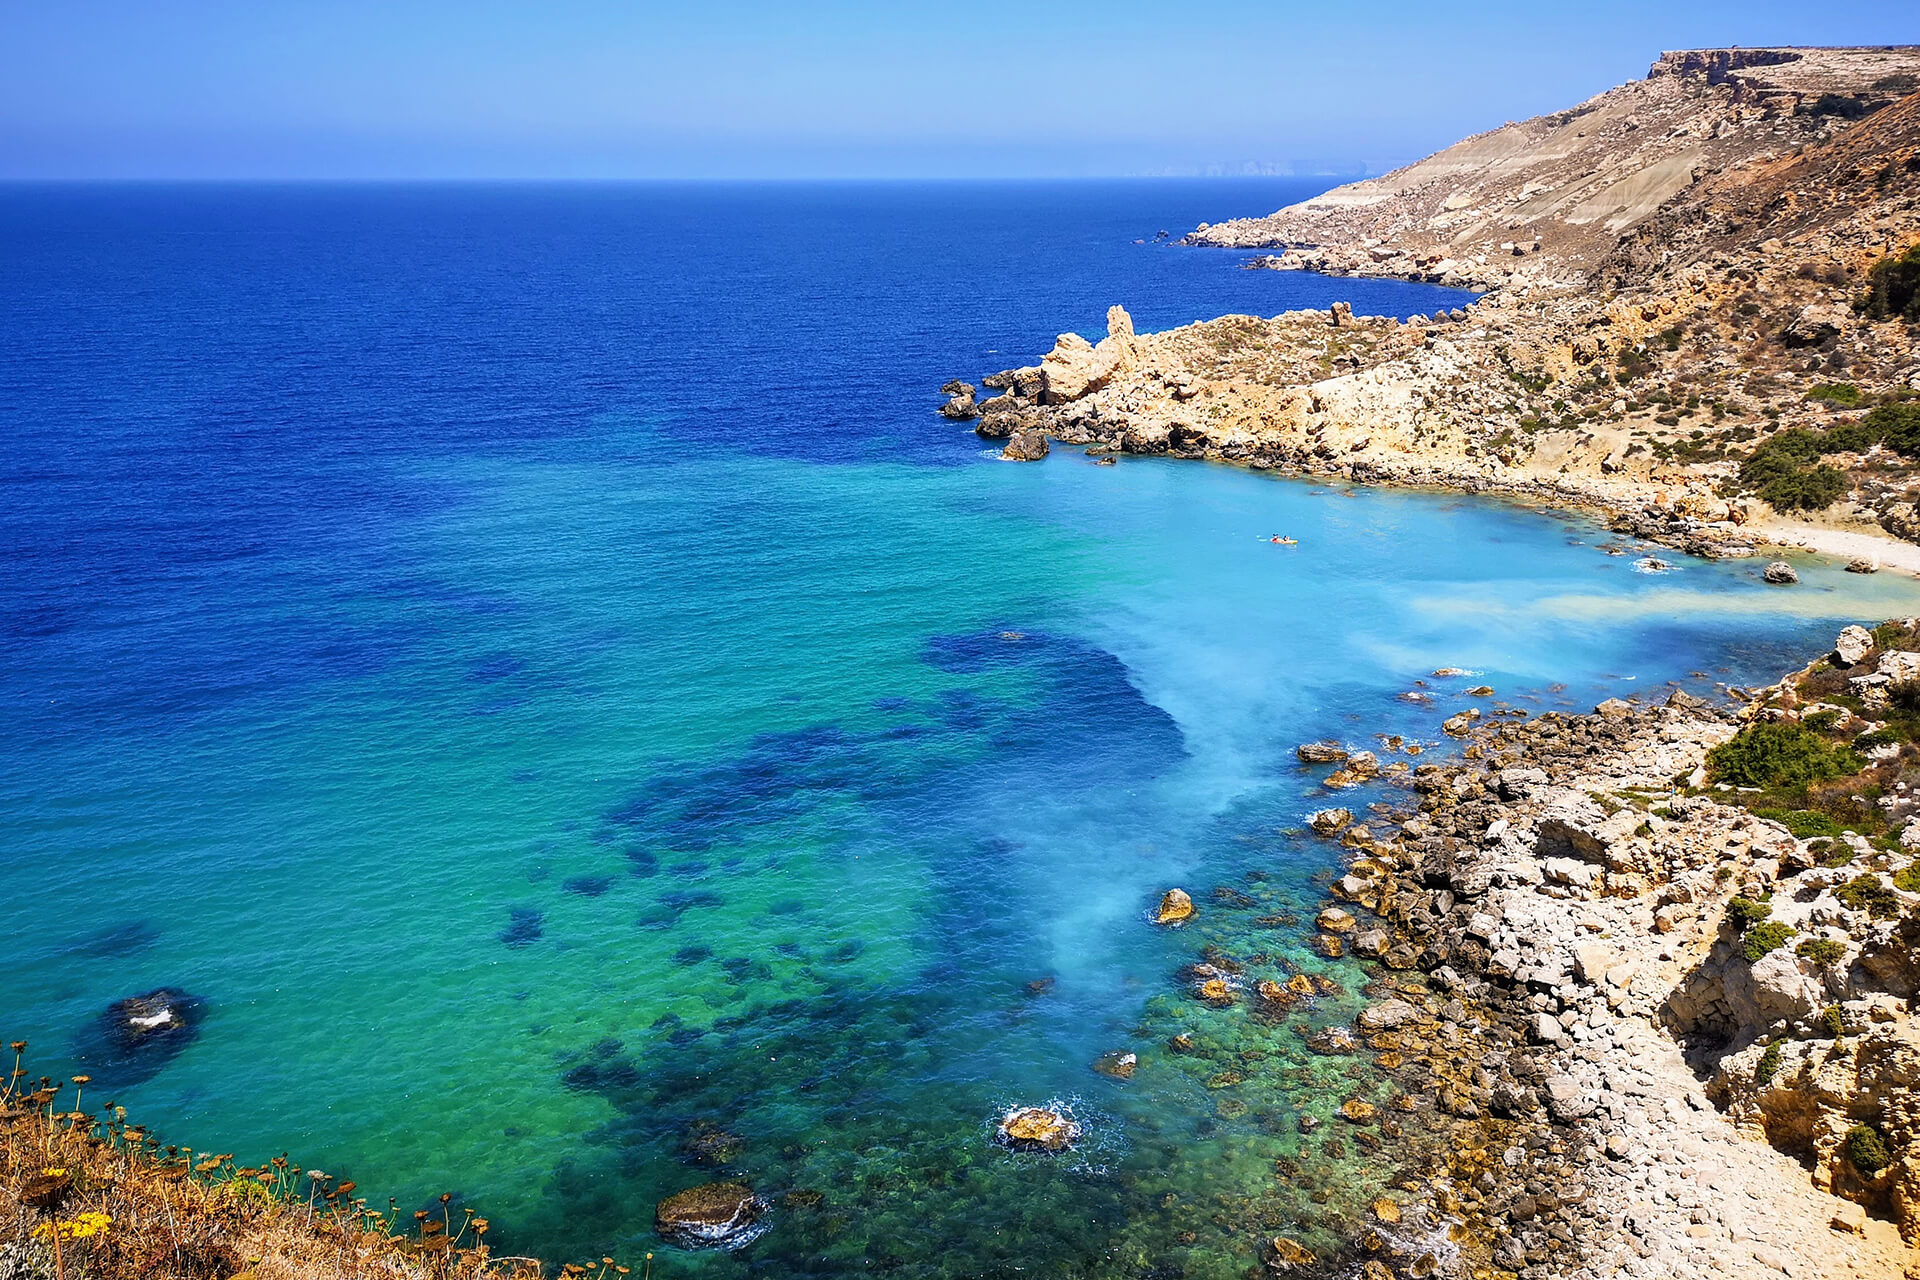 Plage sauvage Malte